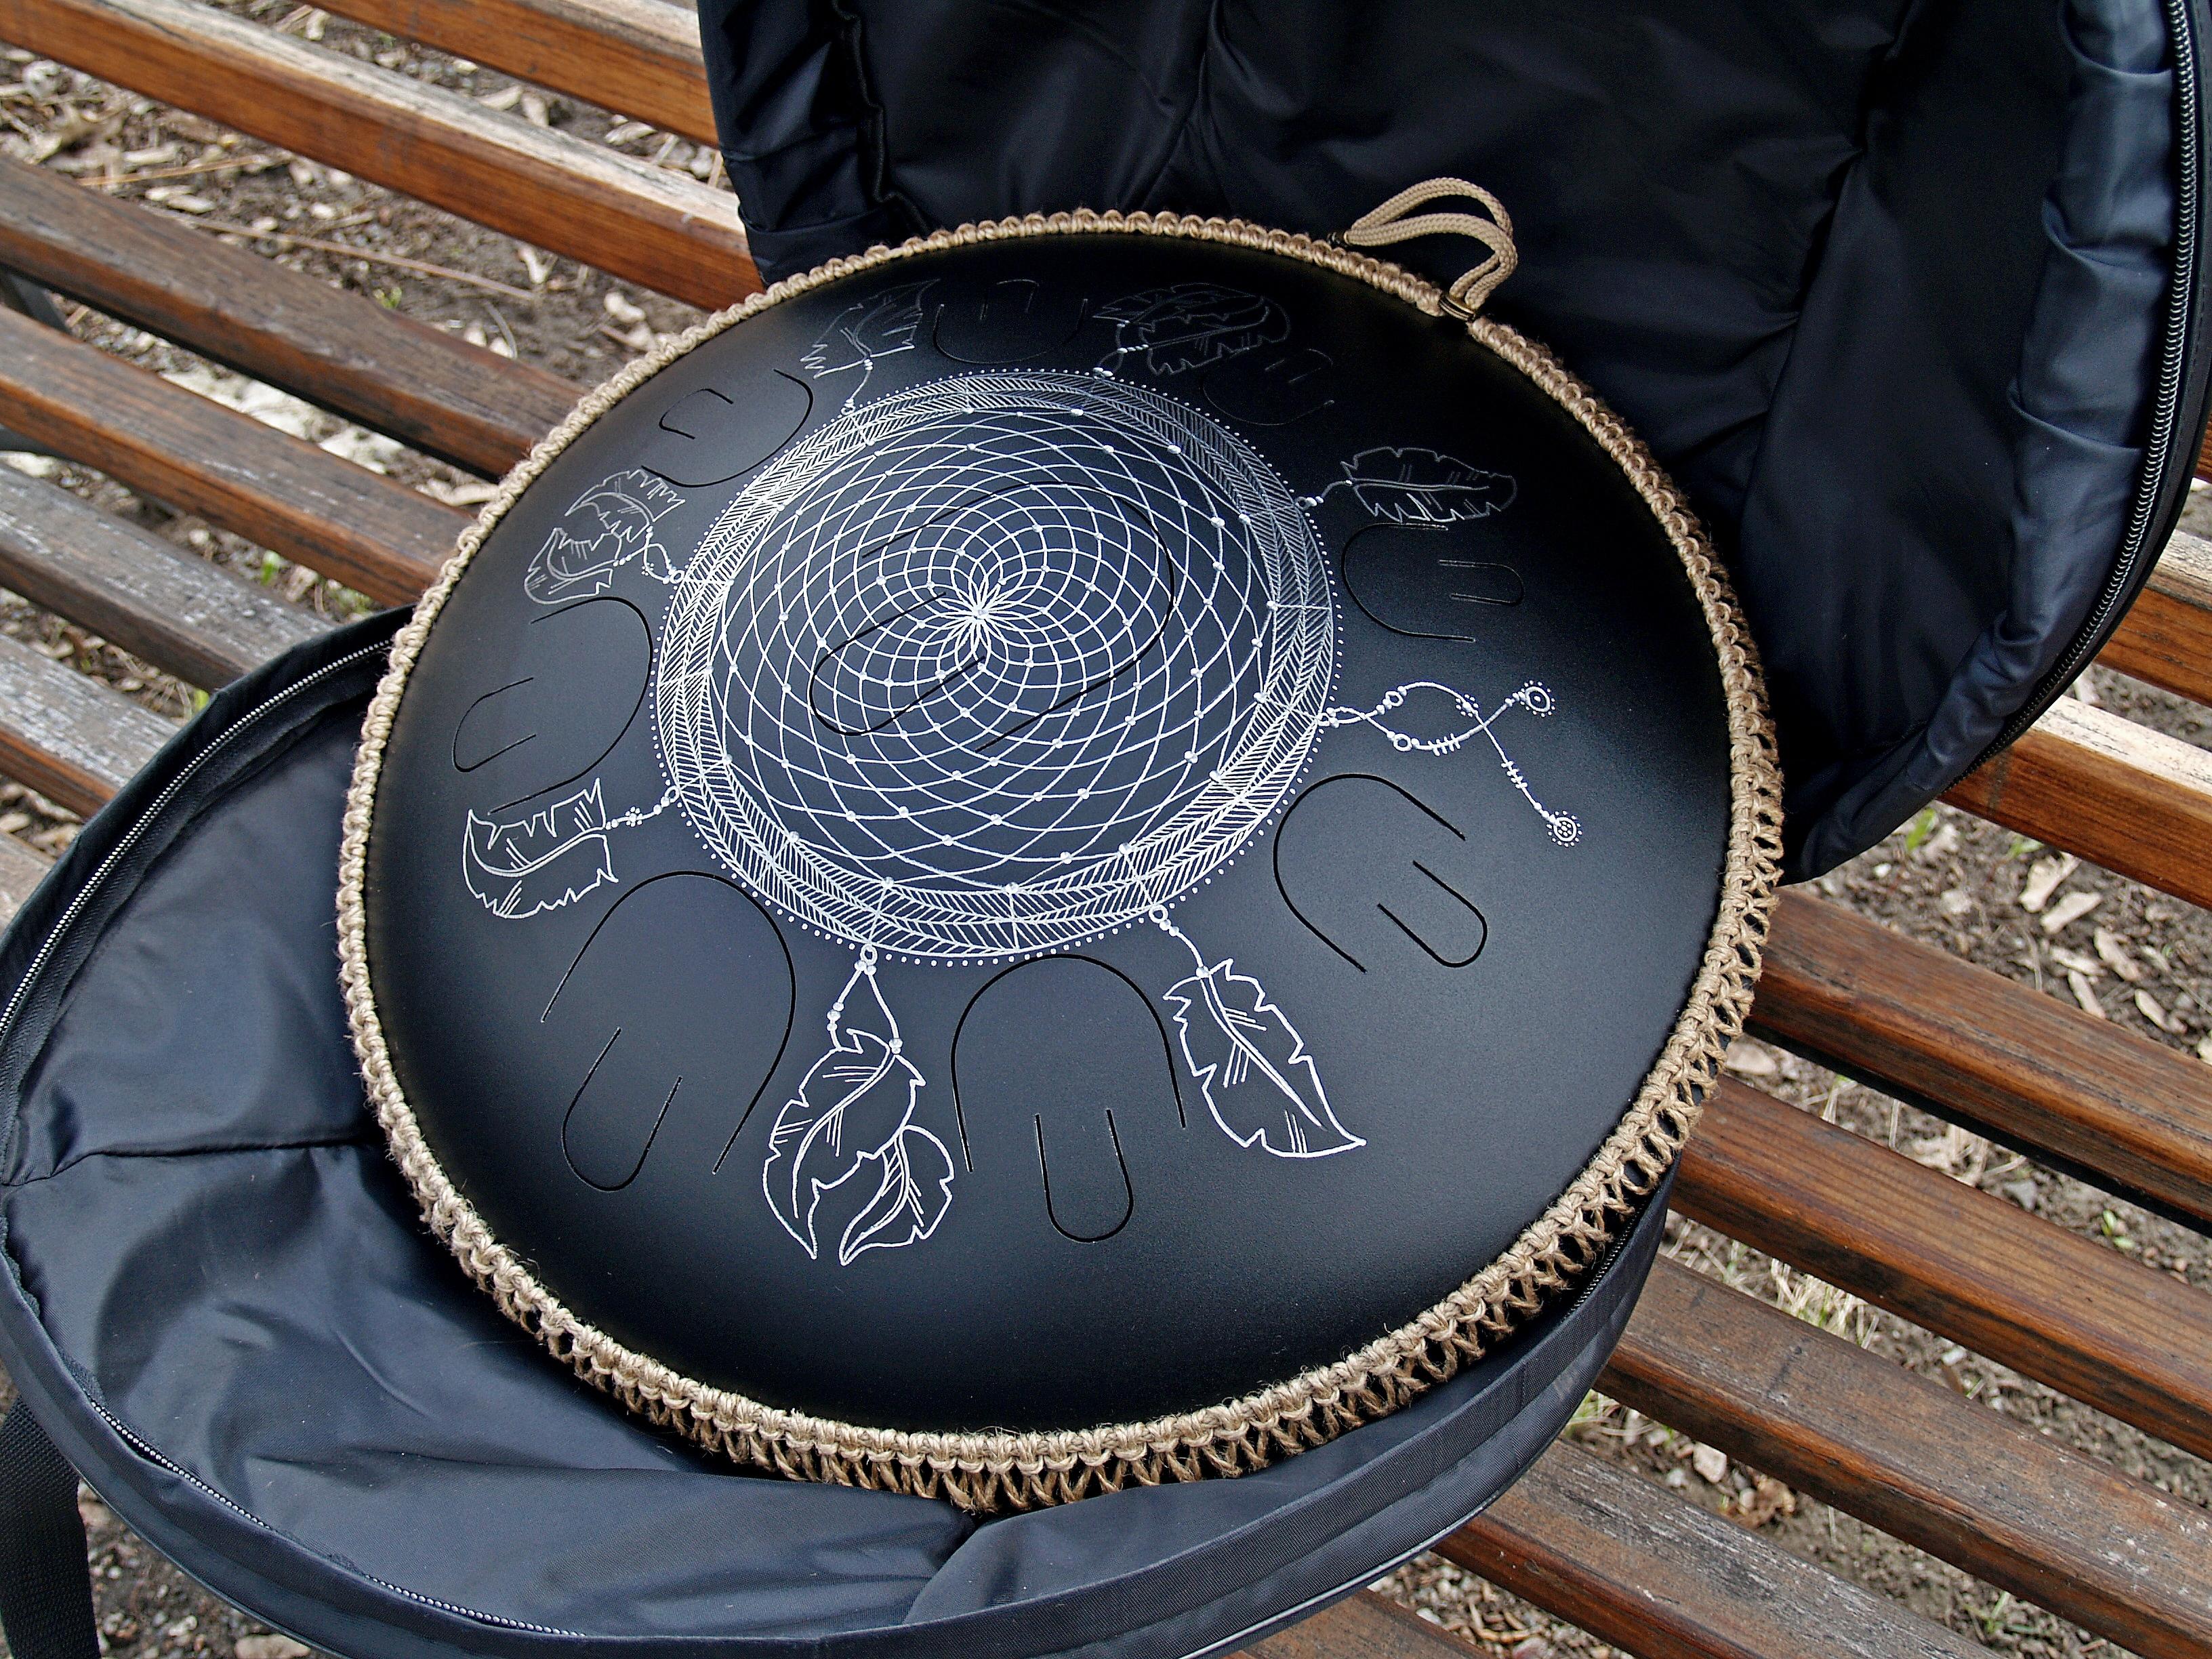 dreamcatcher overtone tongue drum design. Black Bedroom Furniture Sets. Home Design Ideas